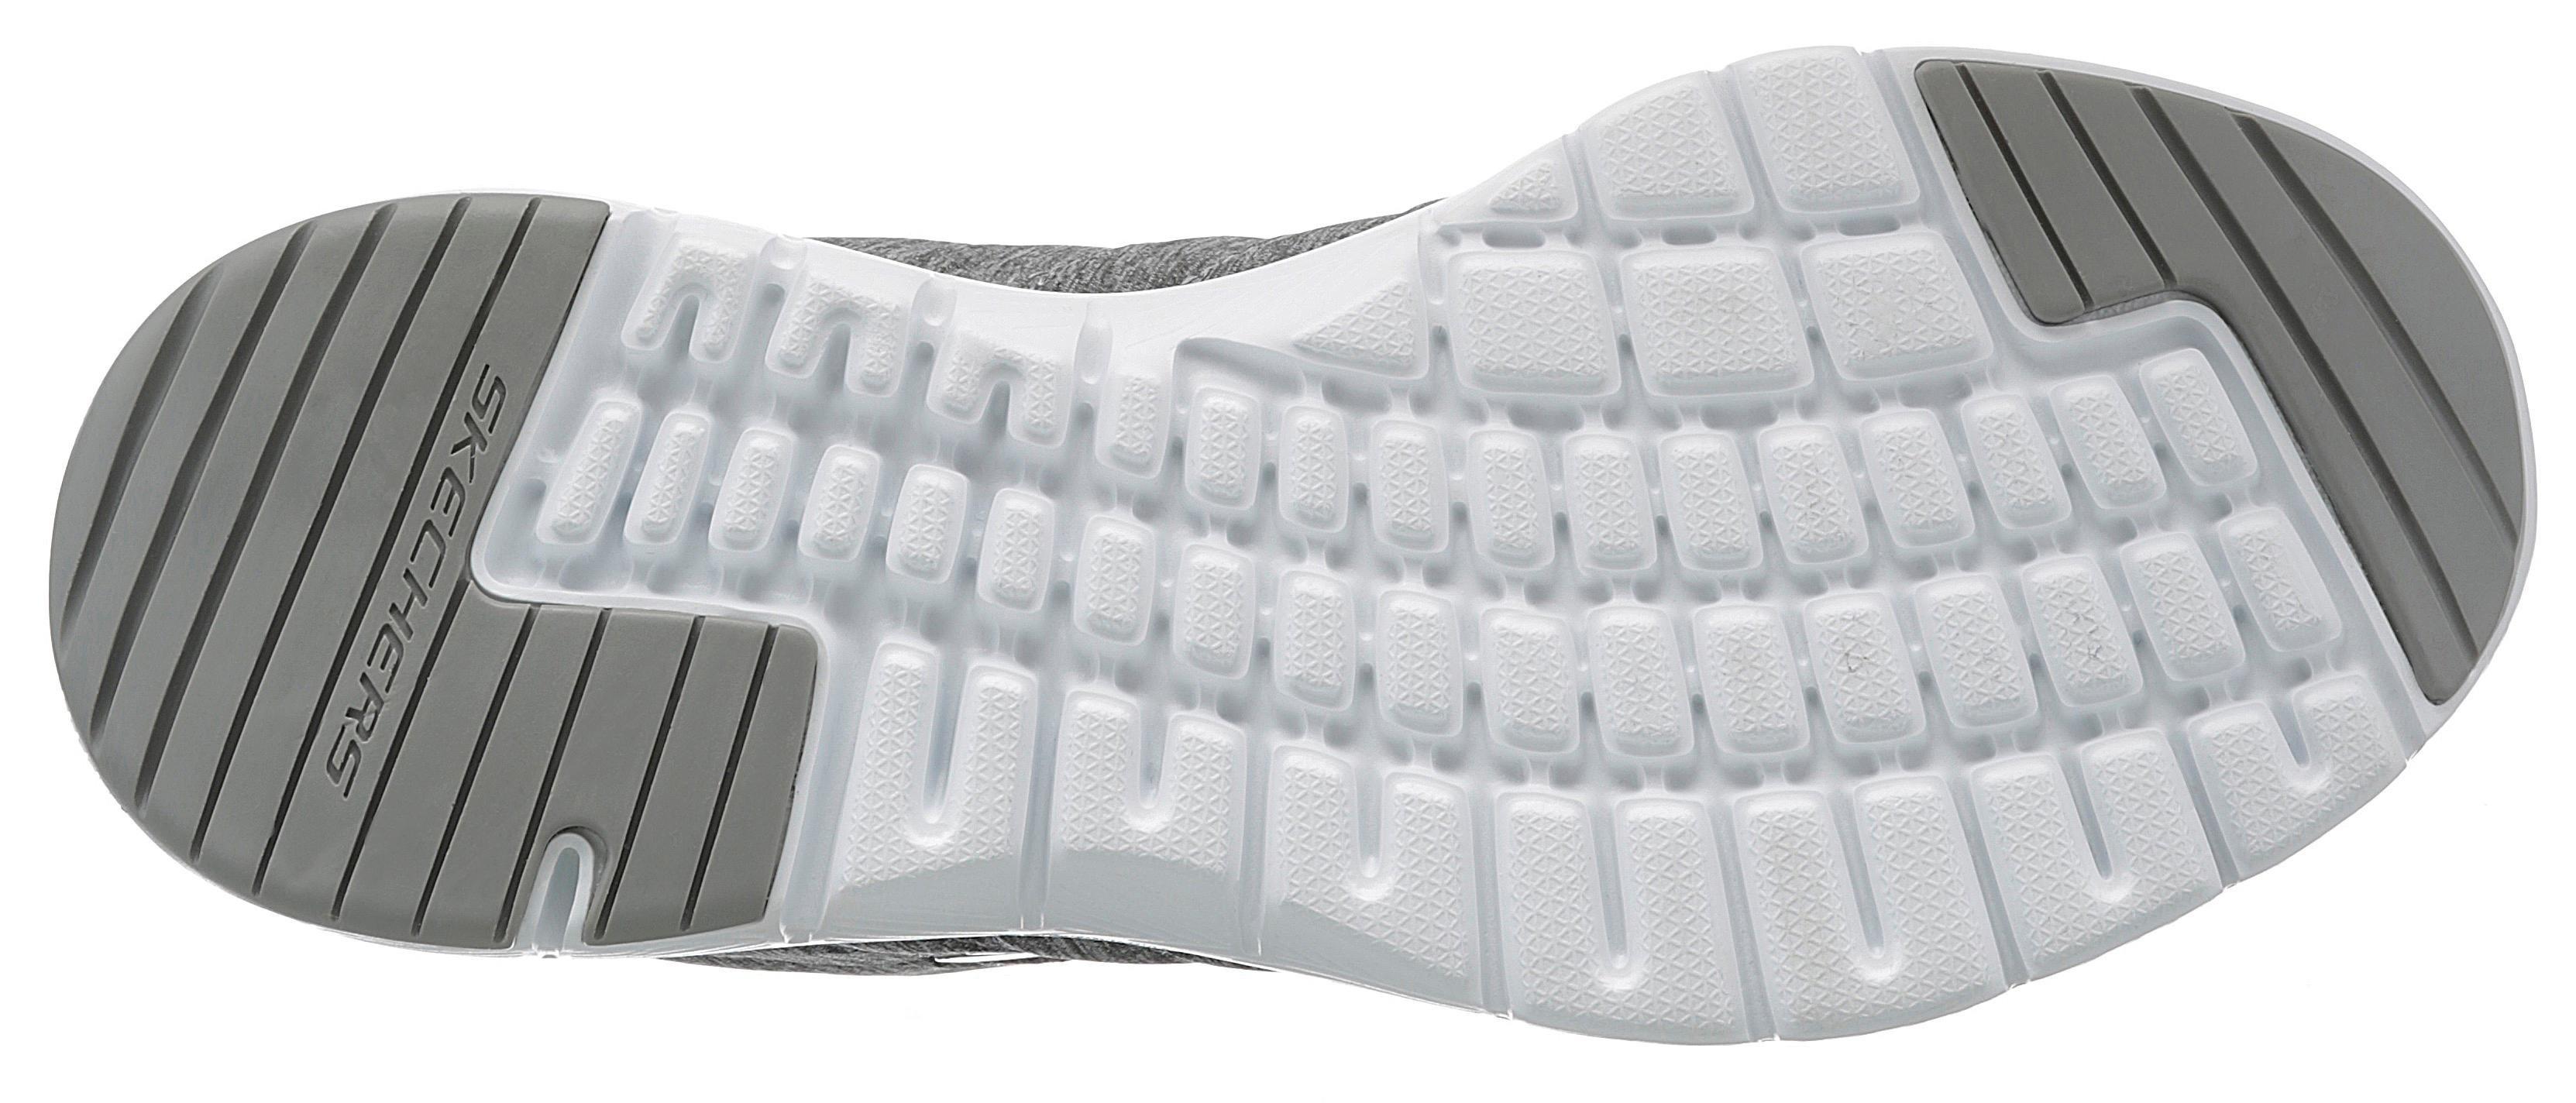 Sneakersflex Appeal Online Kopen 3 Nu 0 Skechers MpVSUzq